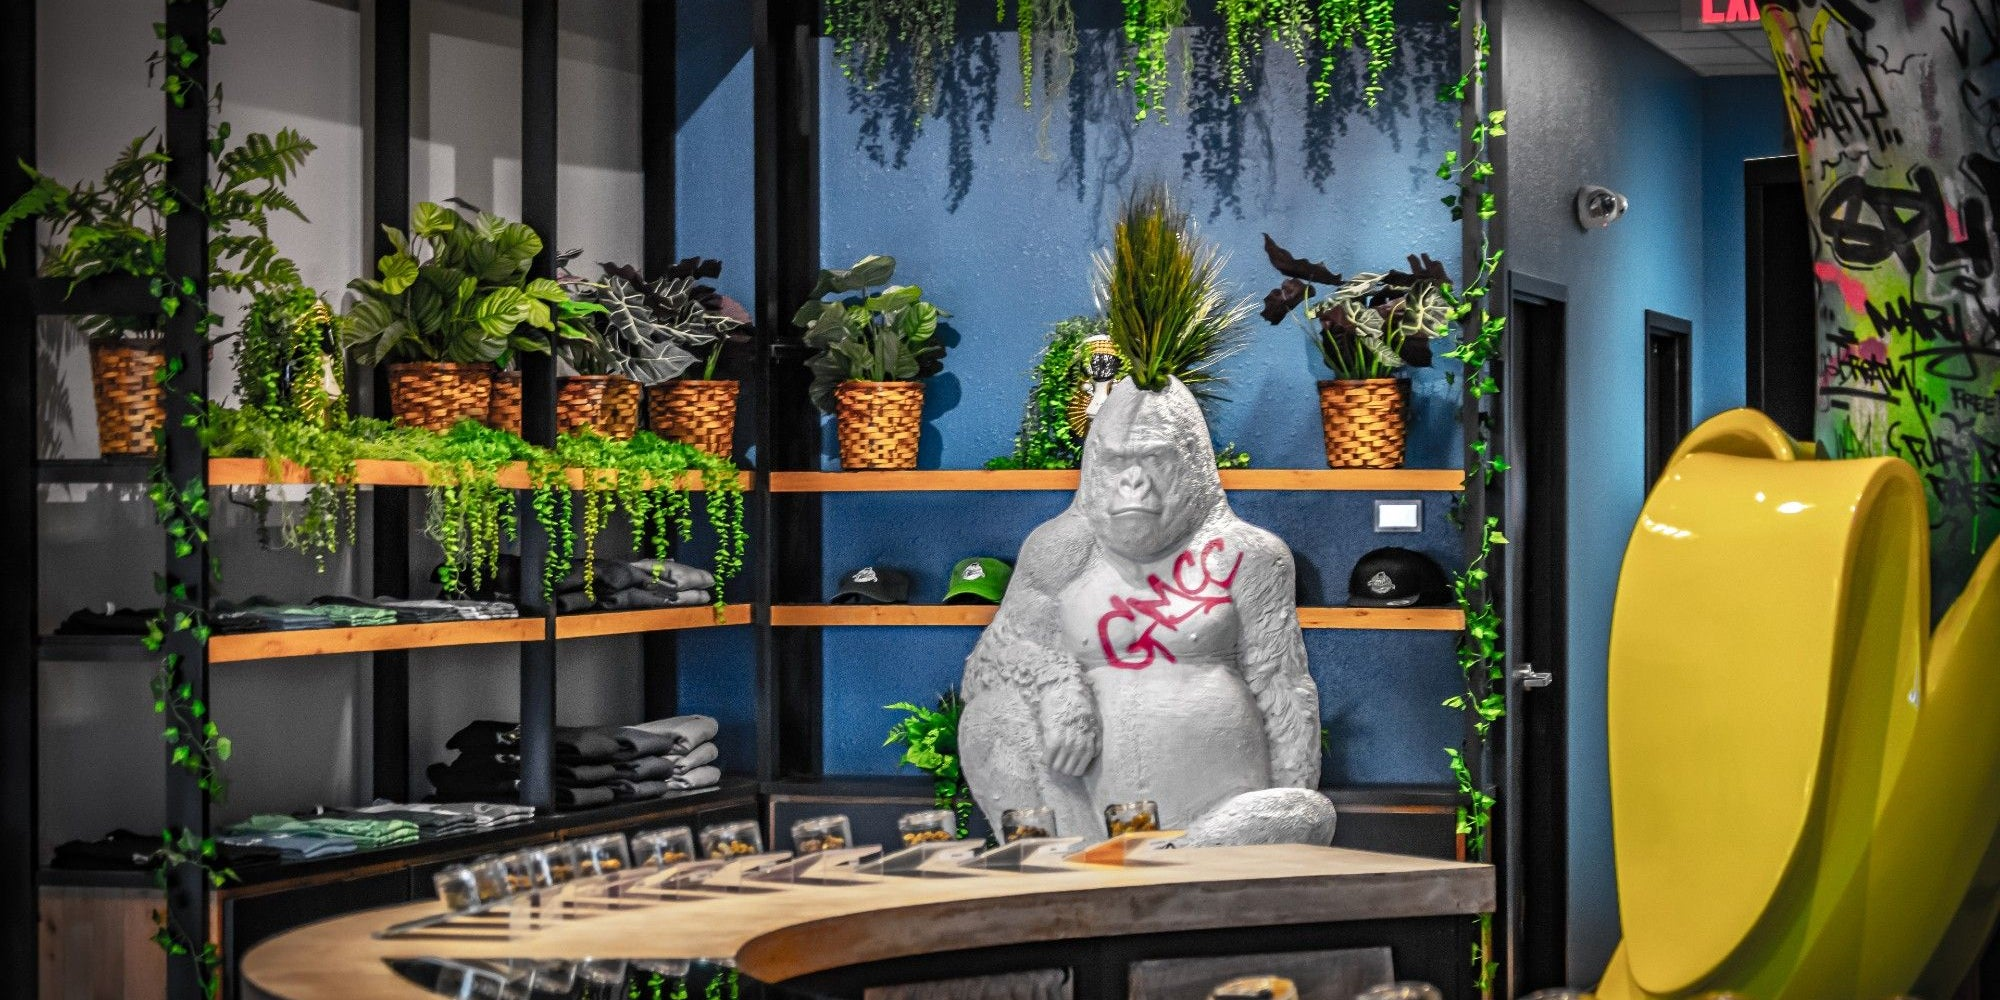 A Former Disney Imagineer Designed This Dispensary - Store Tour of Grass Monkey